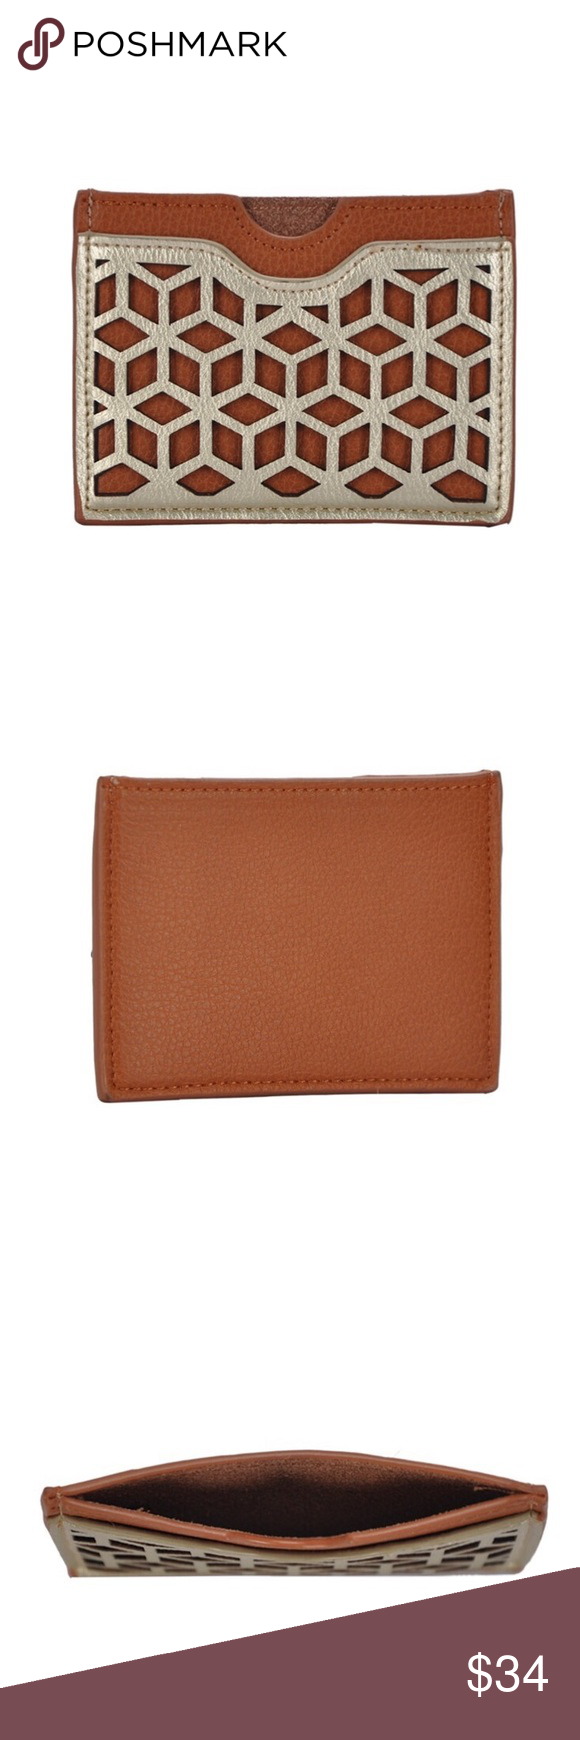 Geometric Card Case Holder | Dark tan, Key card holder and Card case